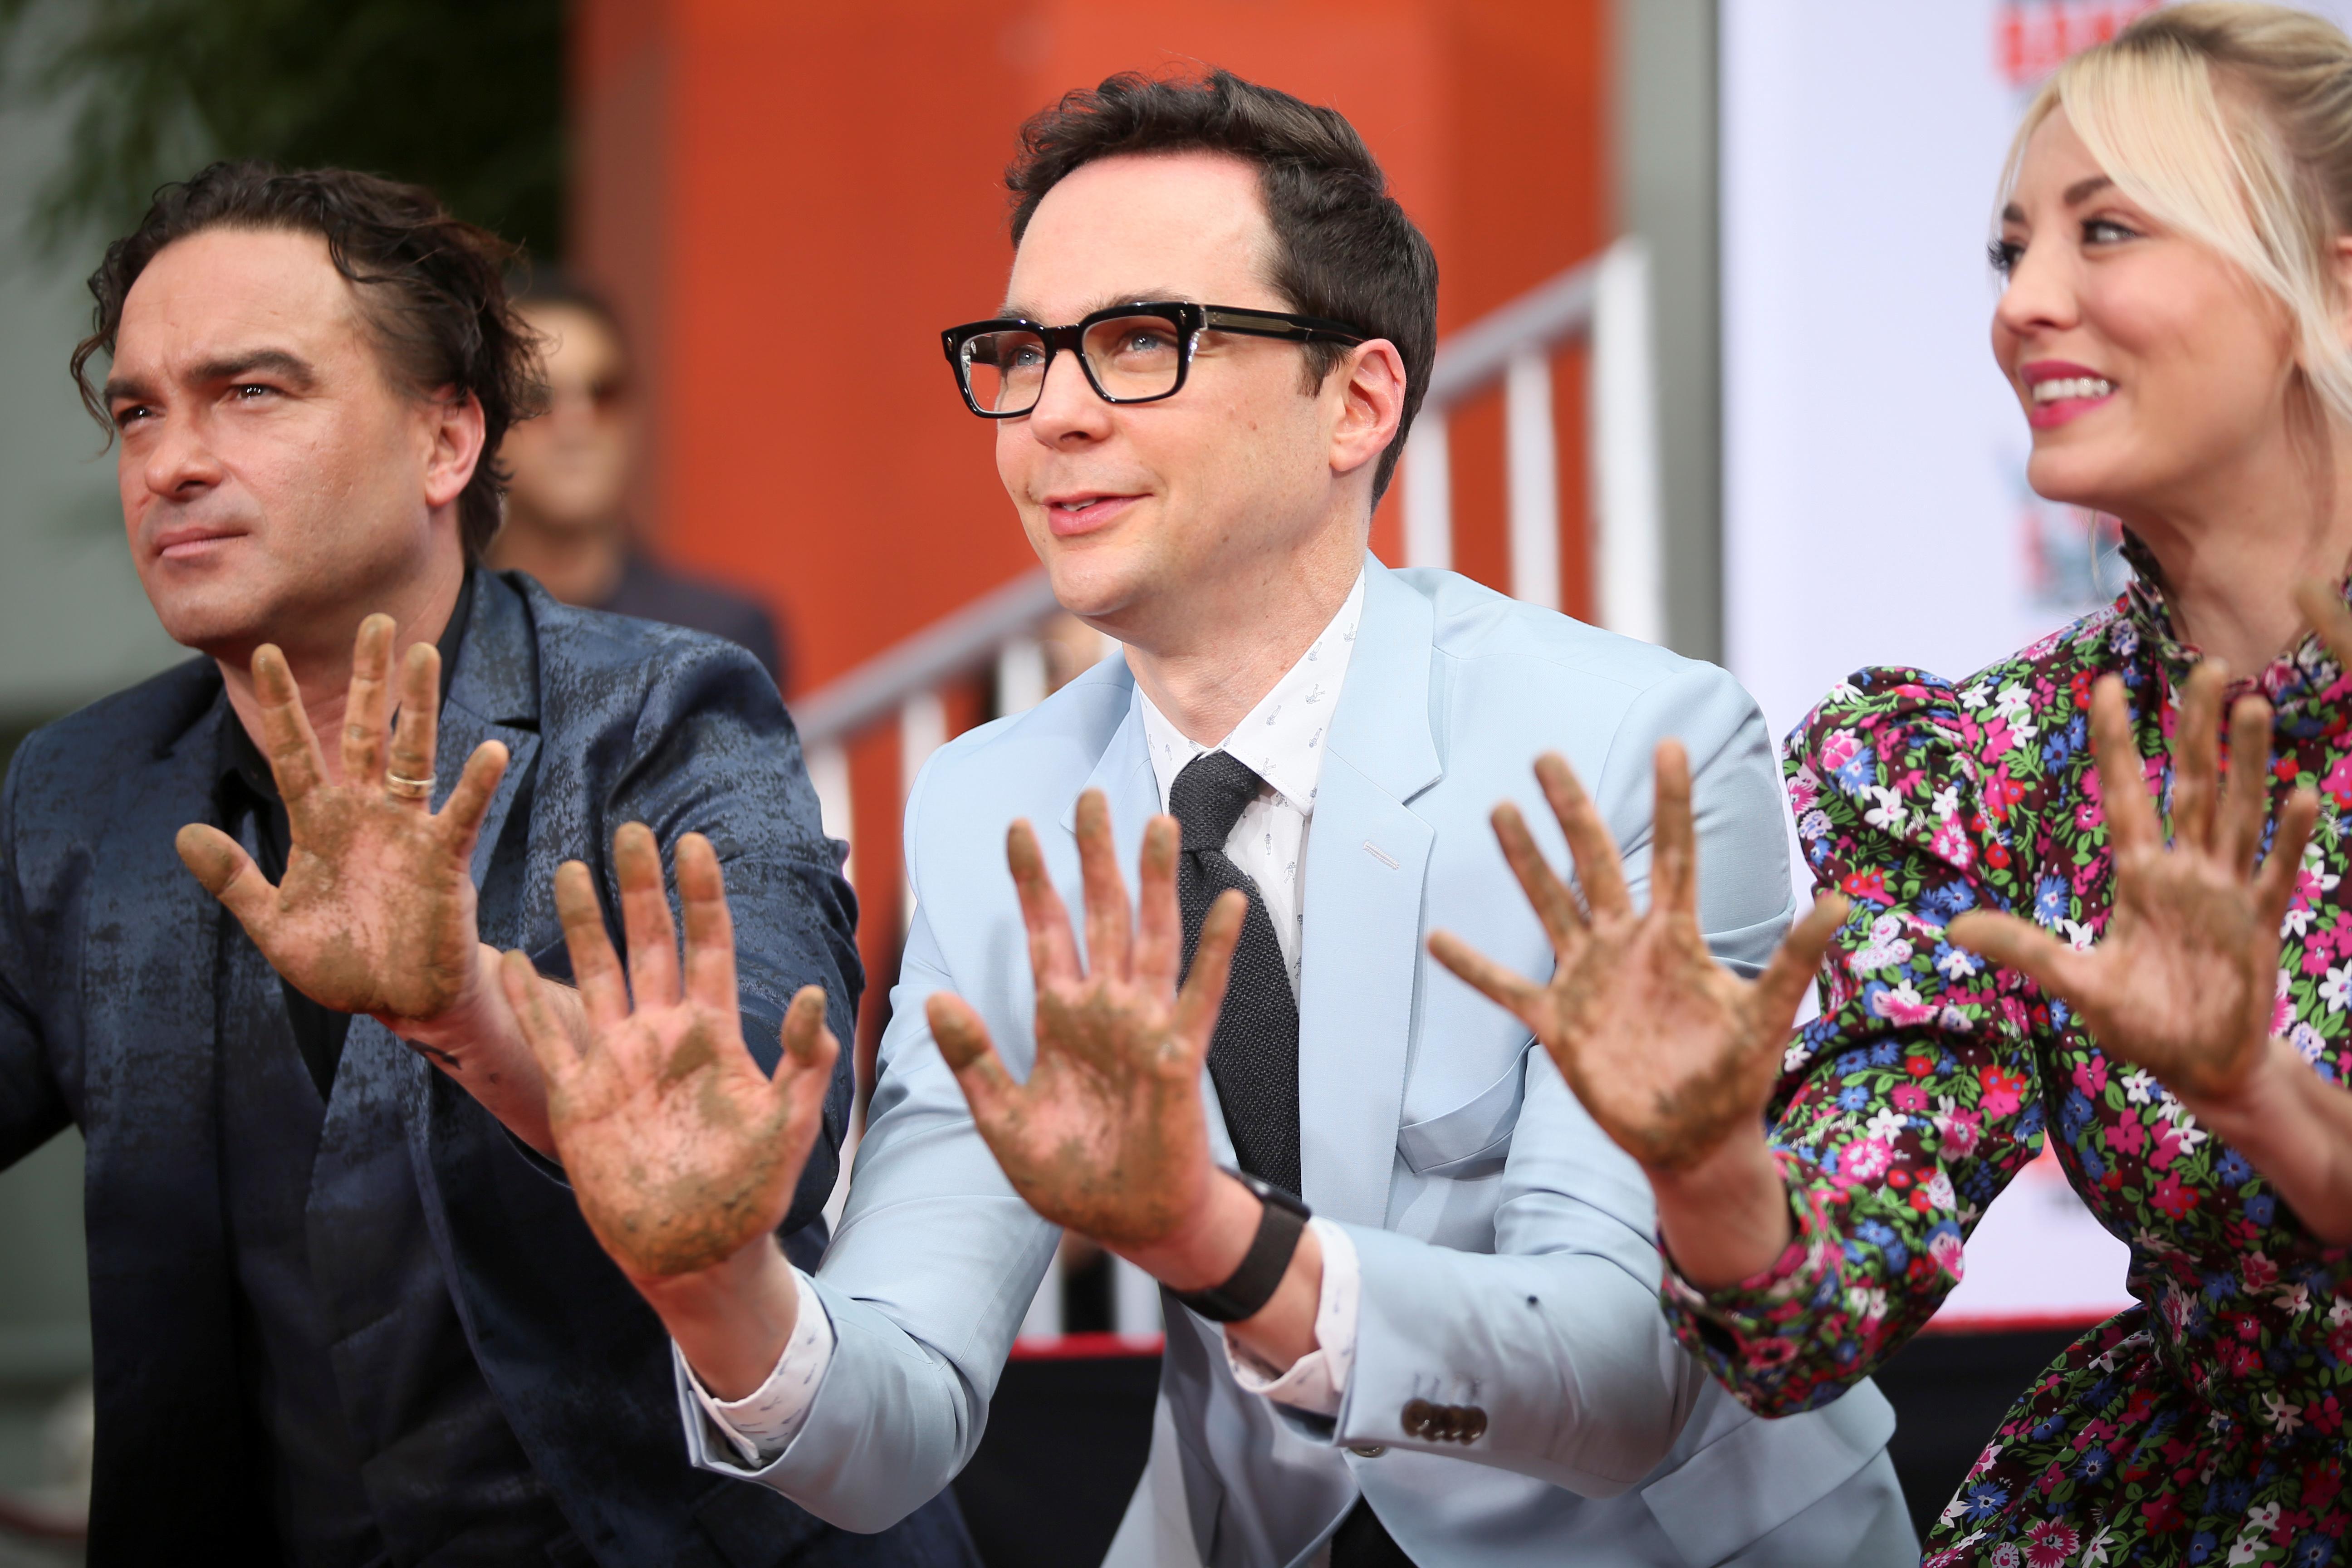 Bazinga! HBO Max wins U.S. streaming rights for 'The Big Bang Theory'